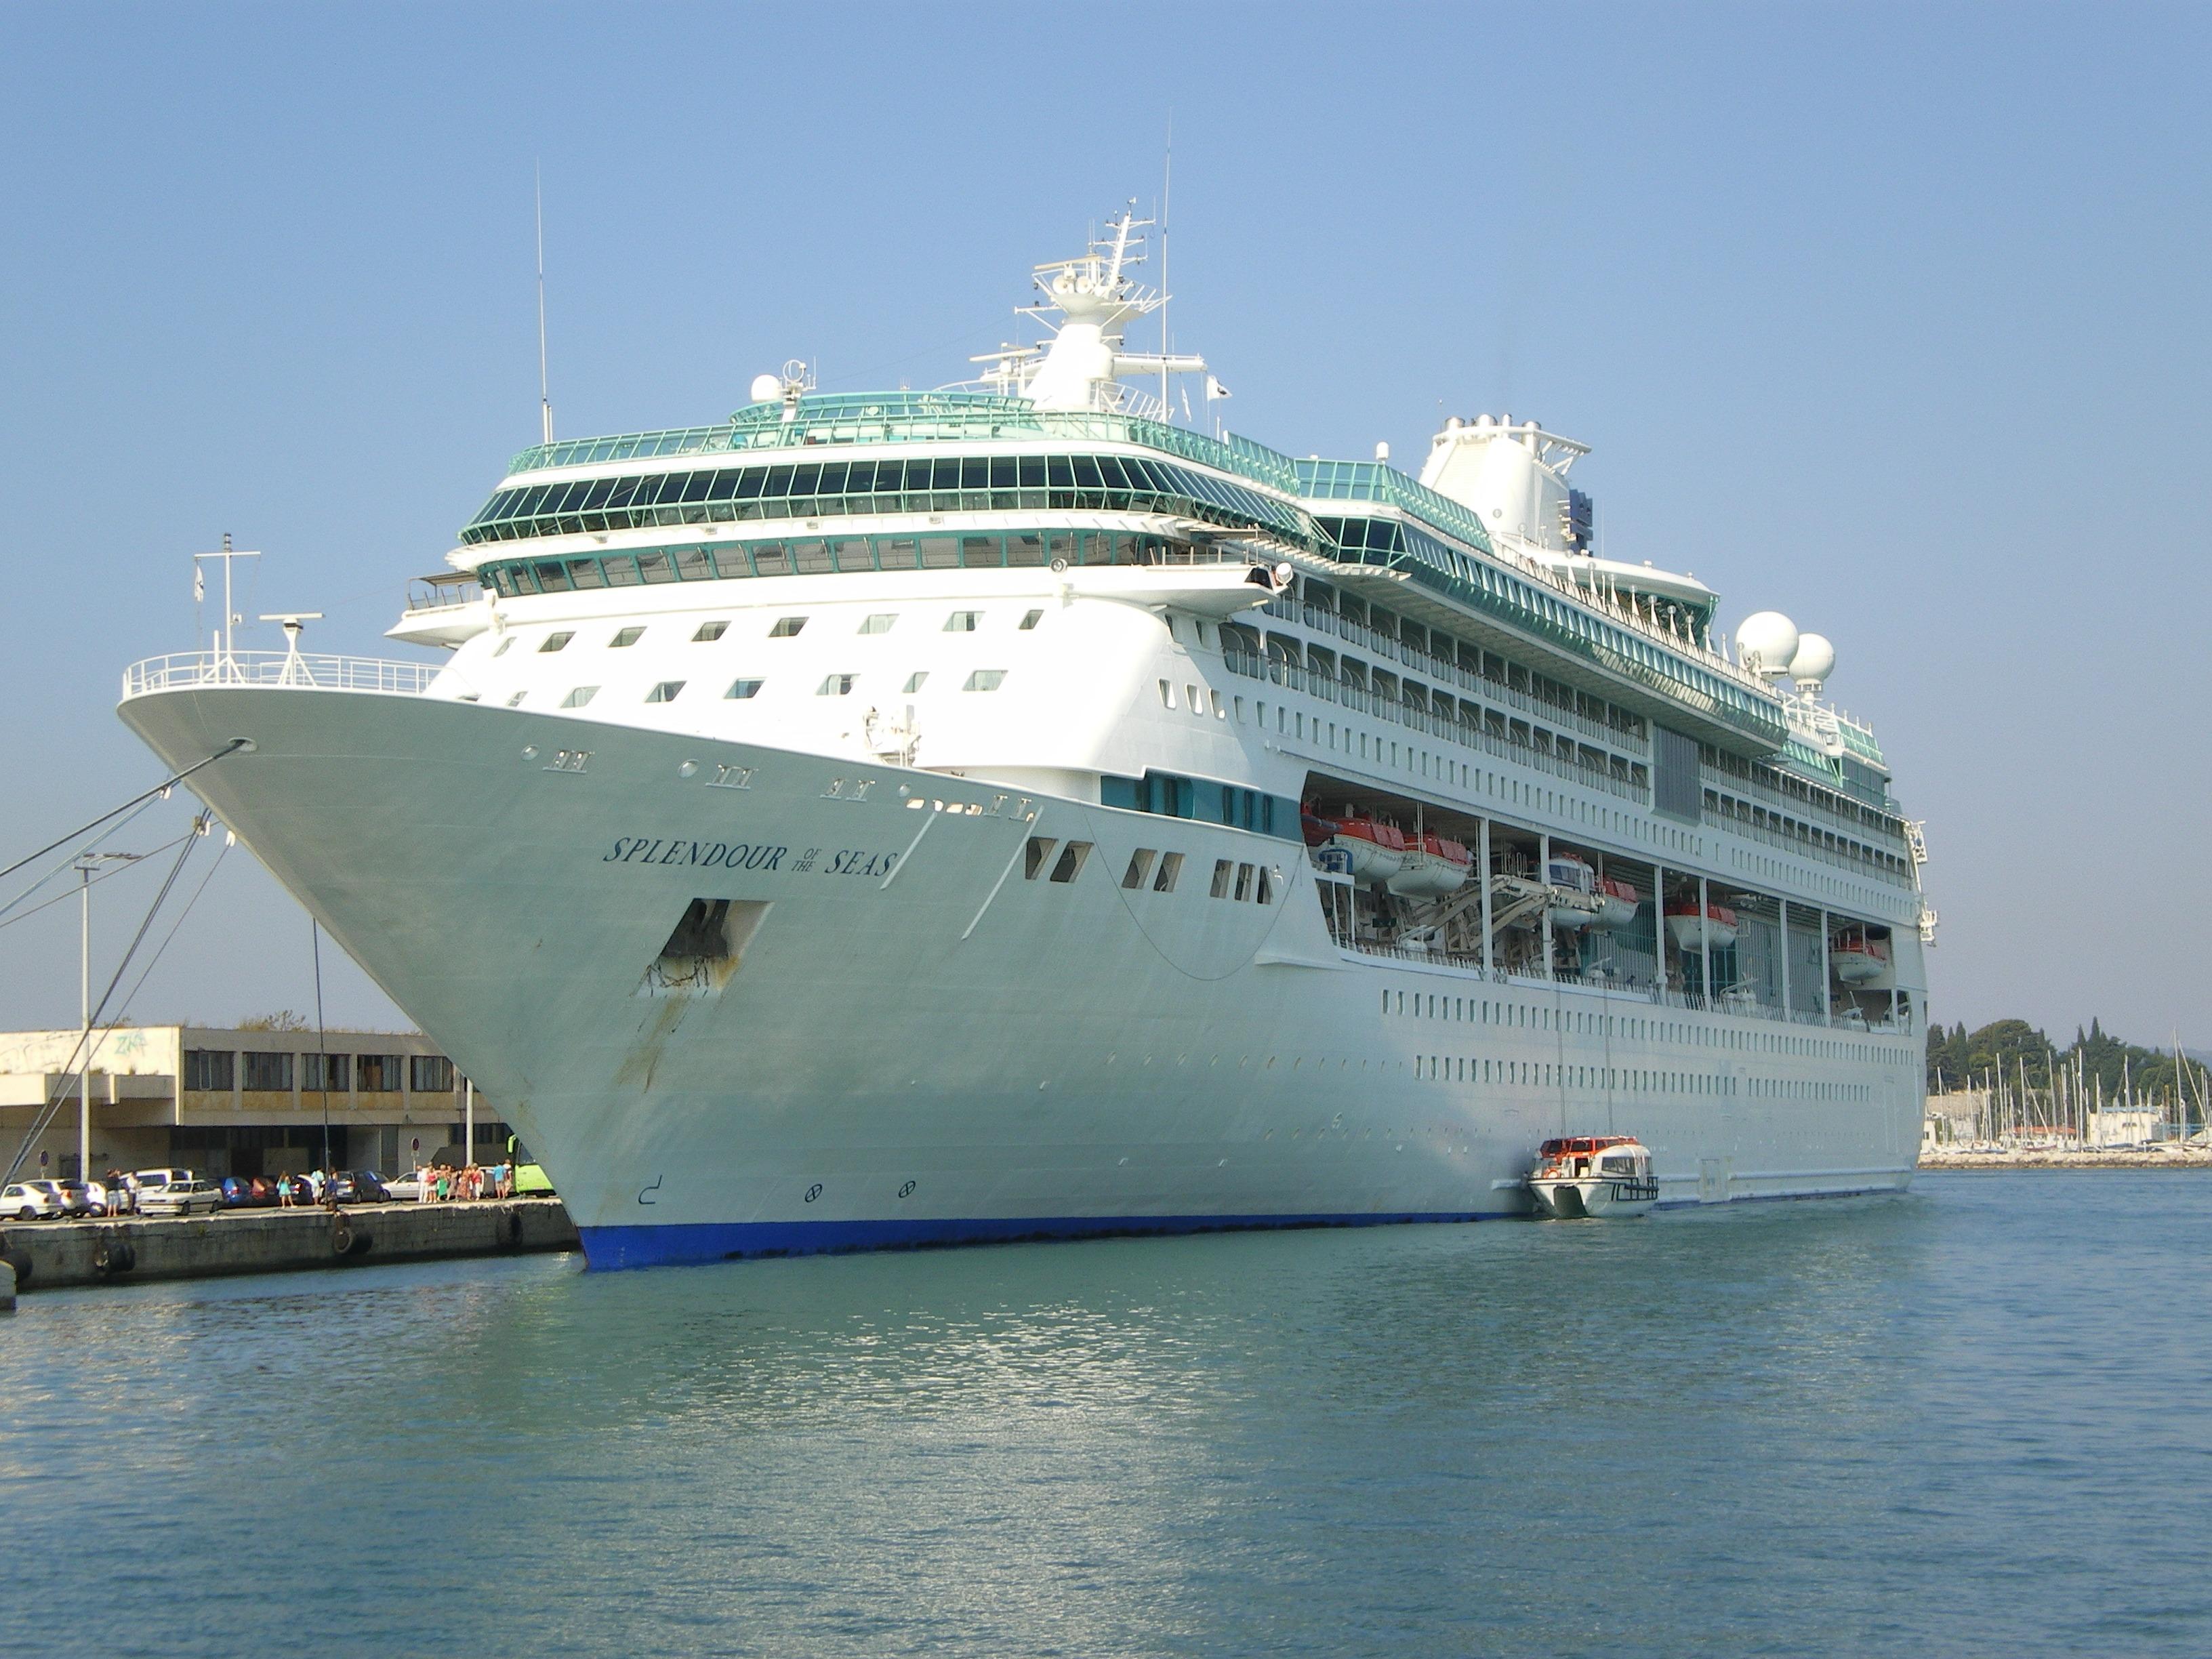 Kreuzfahrten der Splendour Of The Seas 2020 / 2021